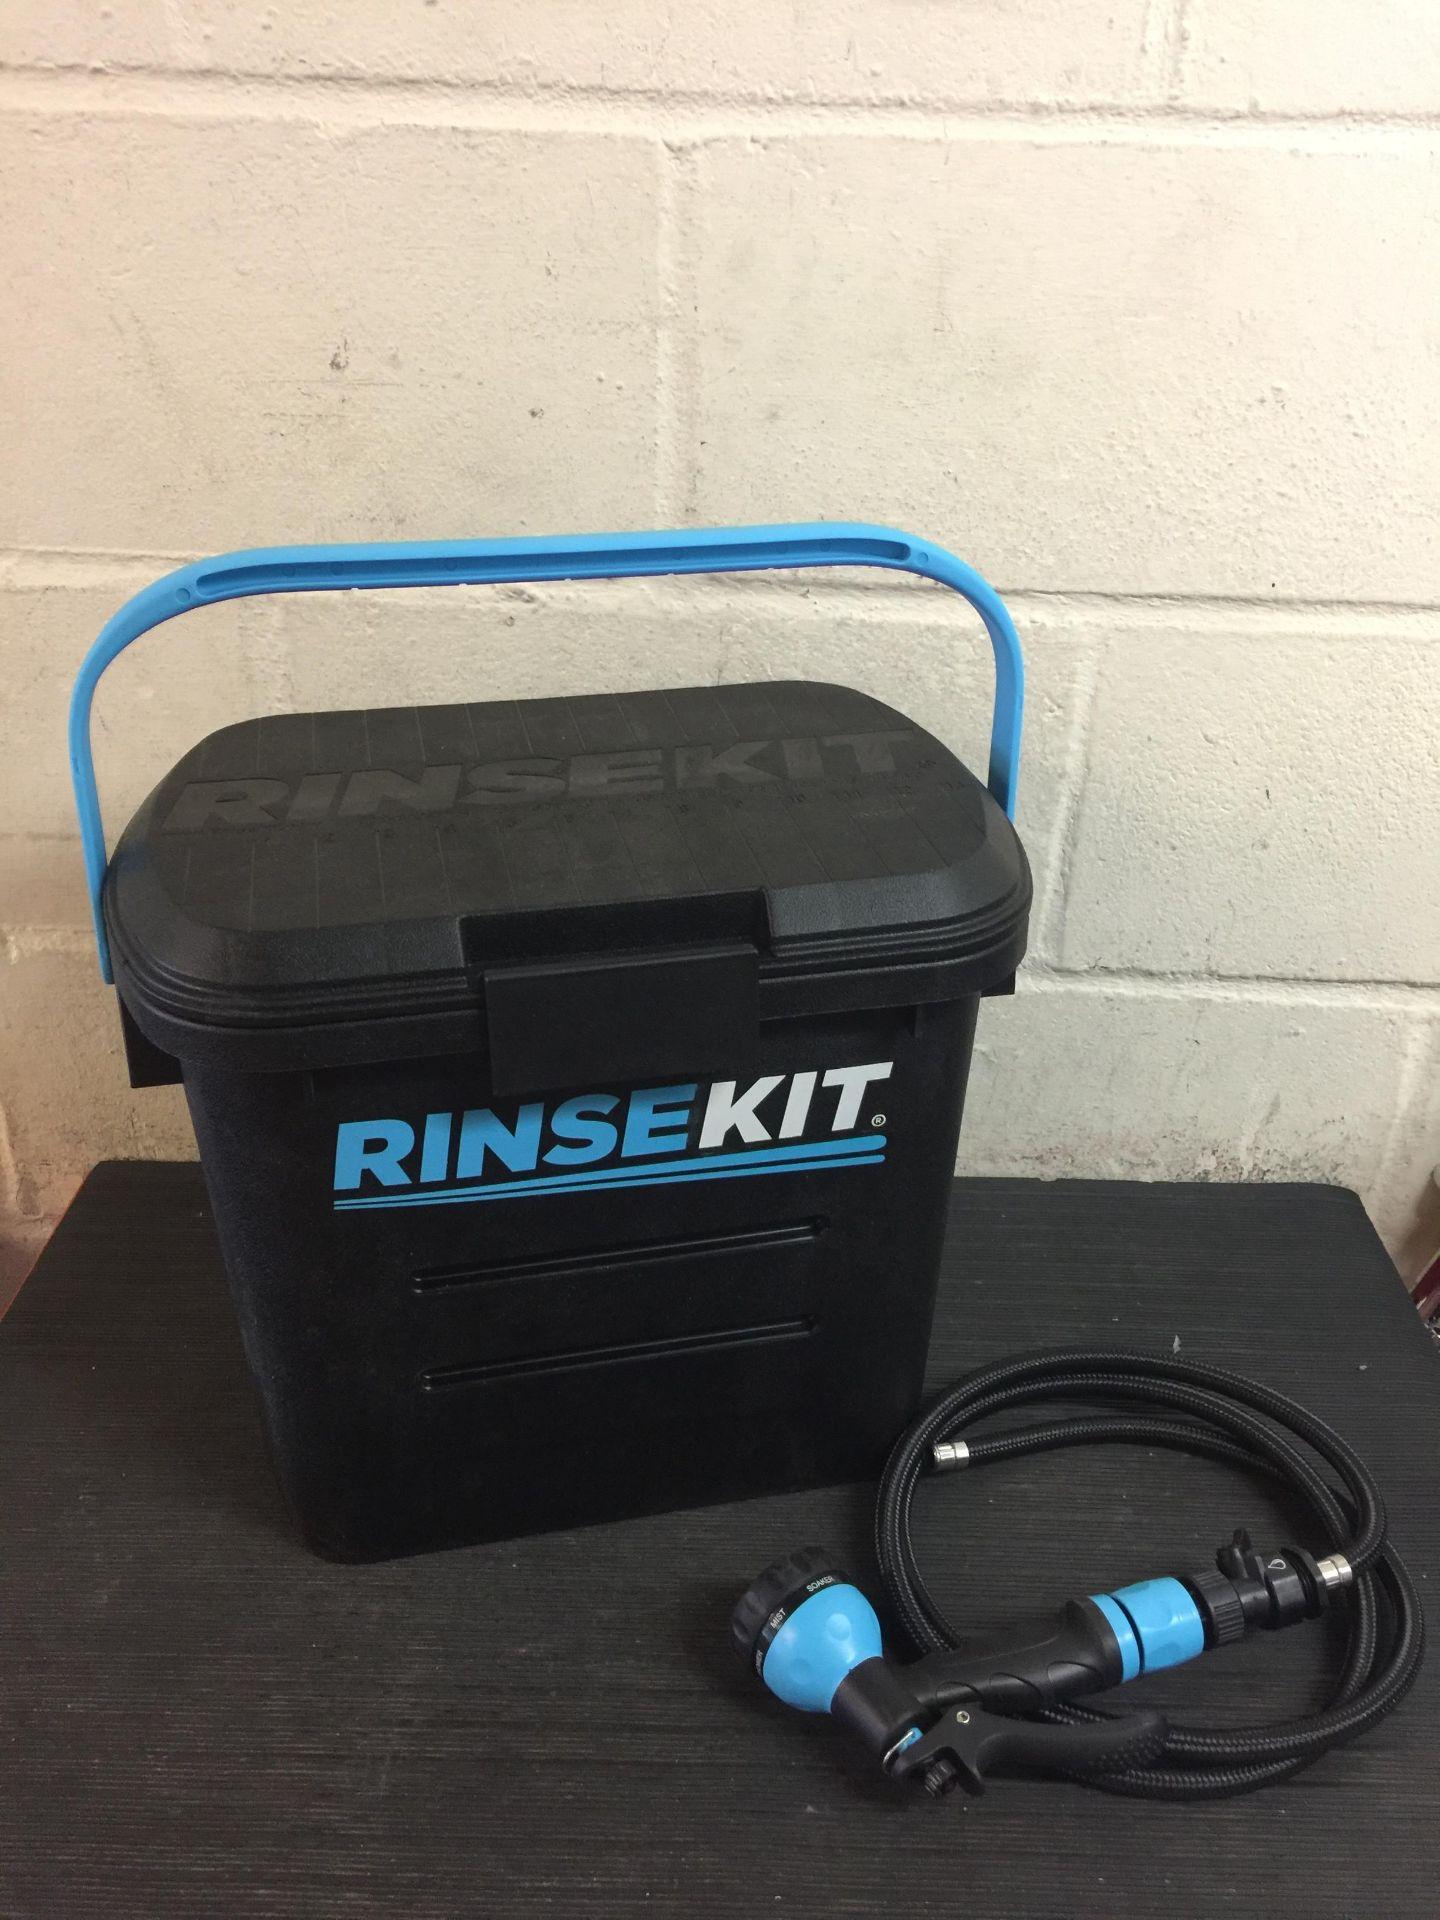 Lot 39 - Rinse Kit Portable Kit - Black (Hose Adapter broken)